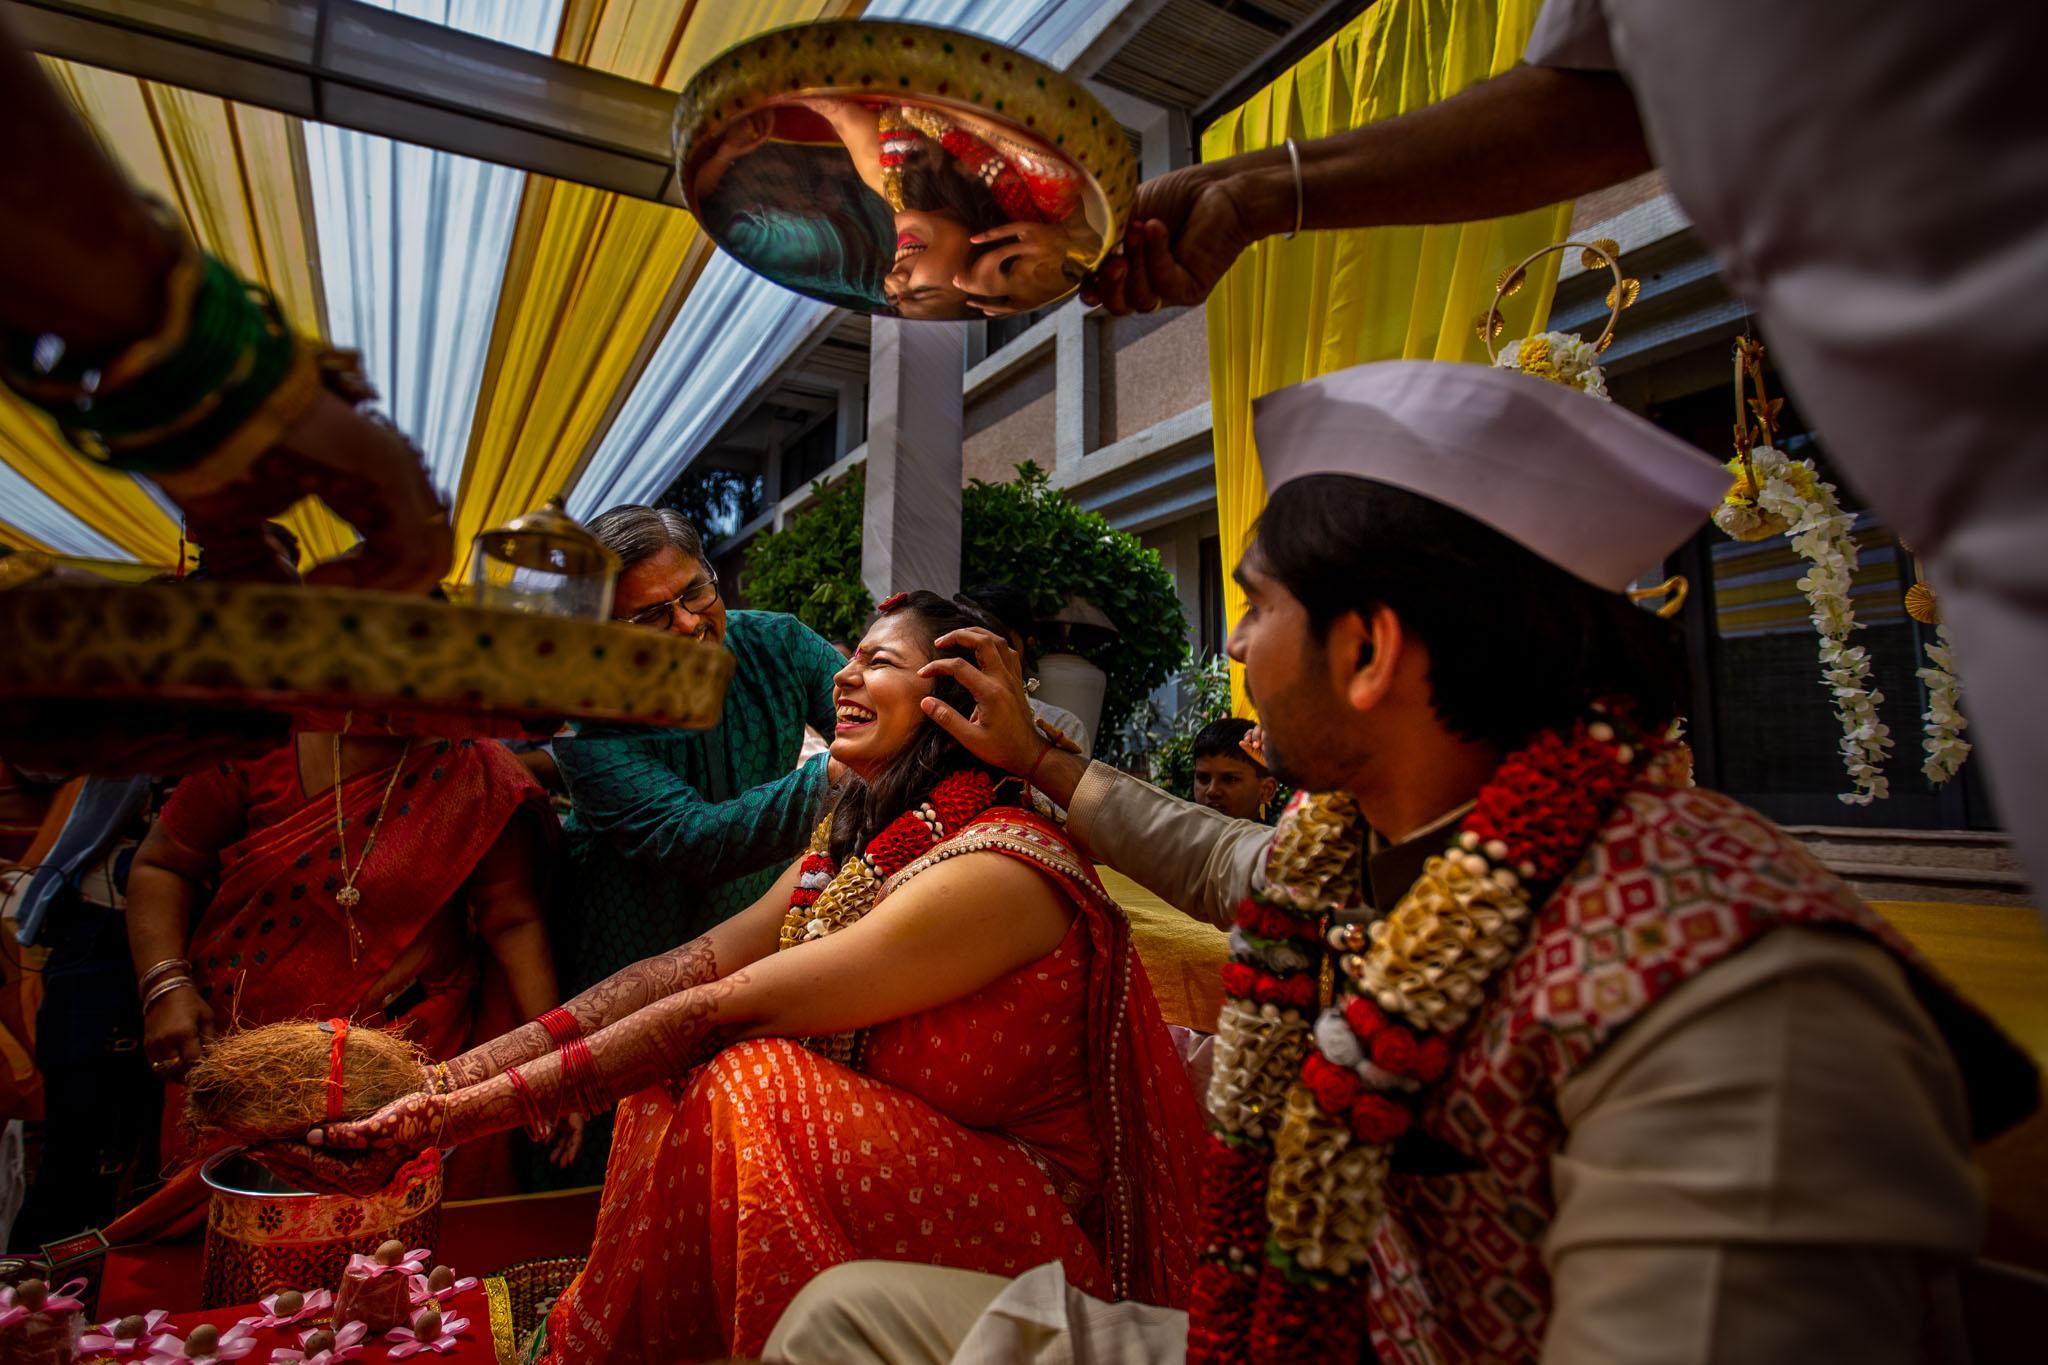 Mukti x Ojas Wedding Akshjay Sansare Photography Best wedding photographer in mumbai India Candid Cinematic Films videos-8.jpg